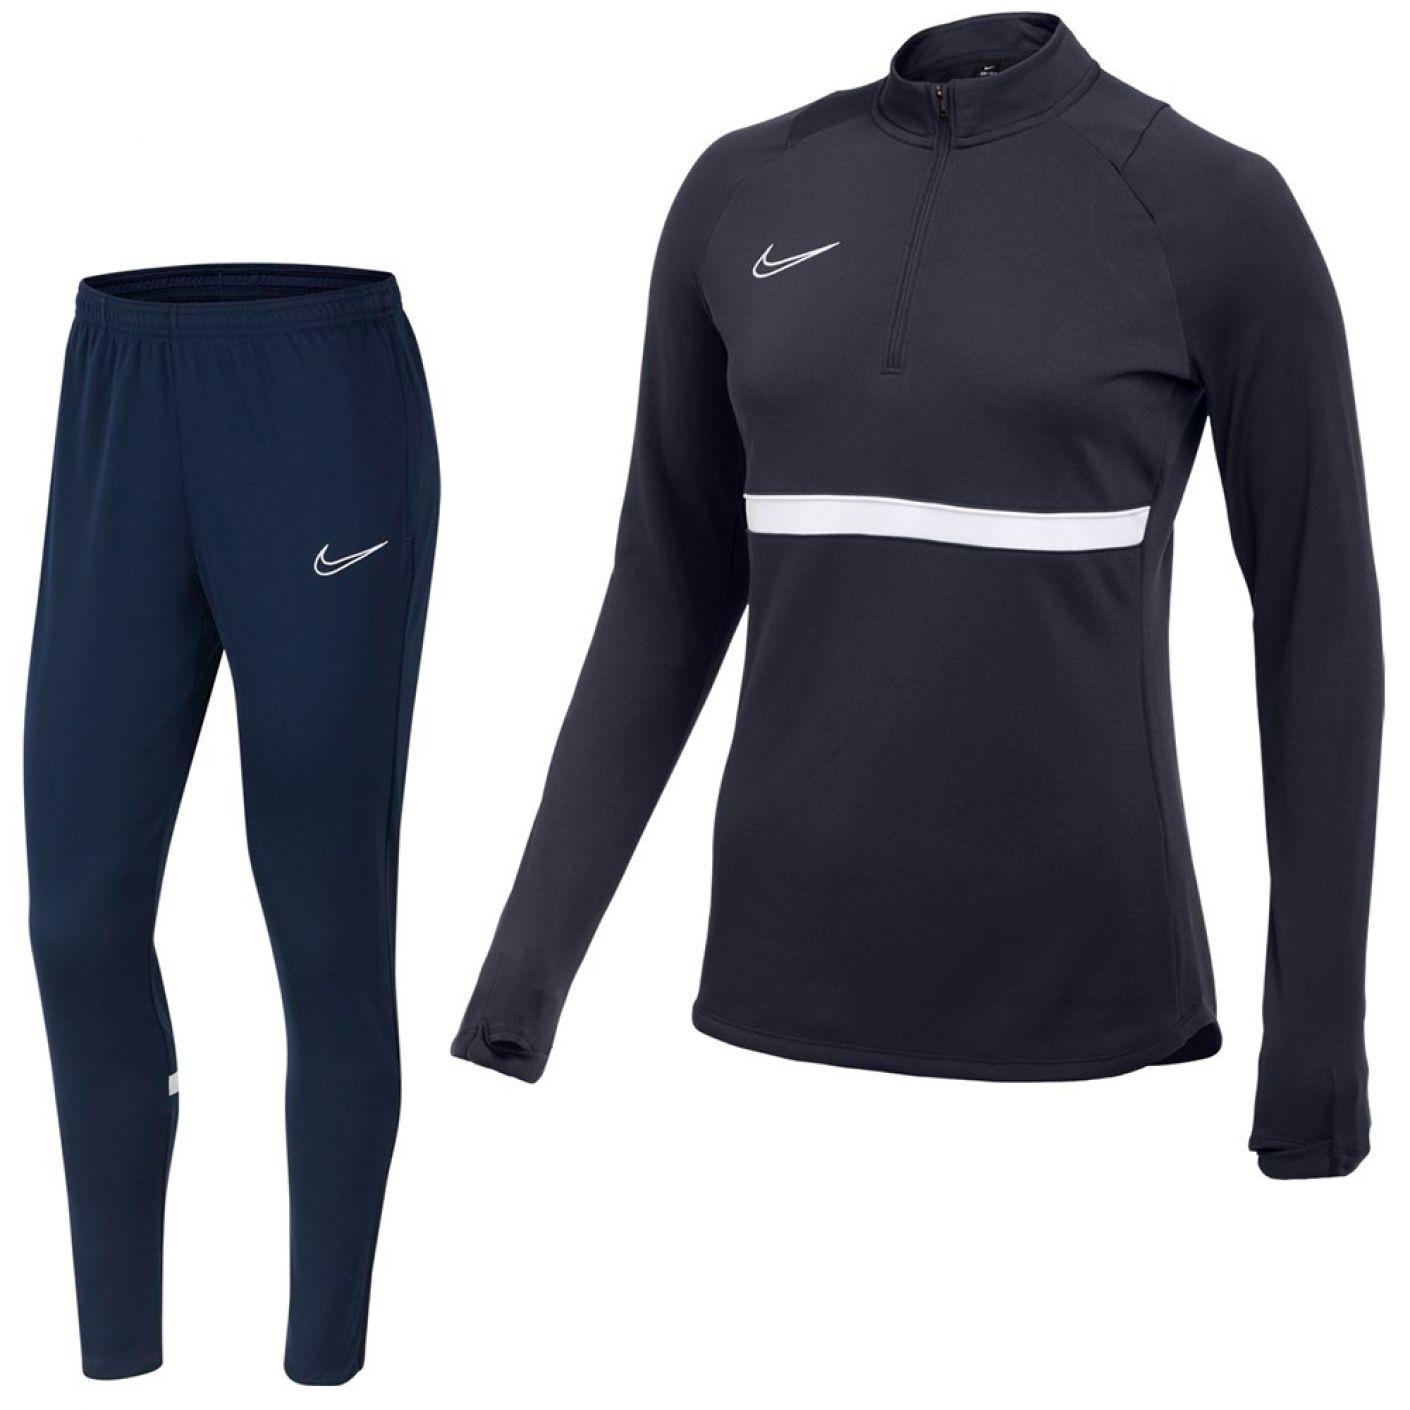 Nike Academy 21 Trainingspak Vrouwen Donkerblauw Wit